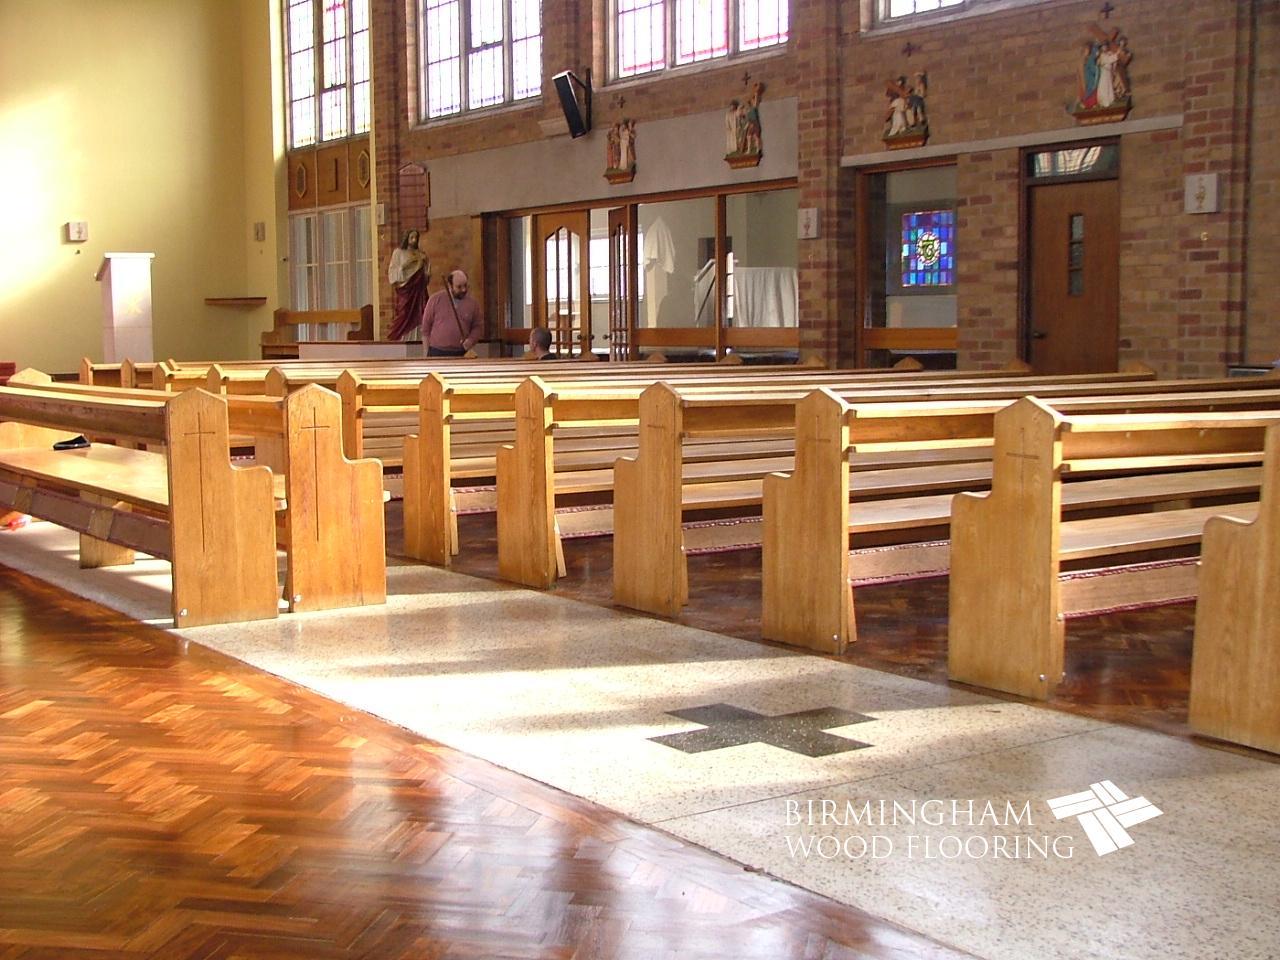 Church Wood Flooring Birmingham Floor Sanding Birmingham